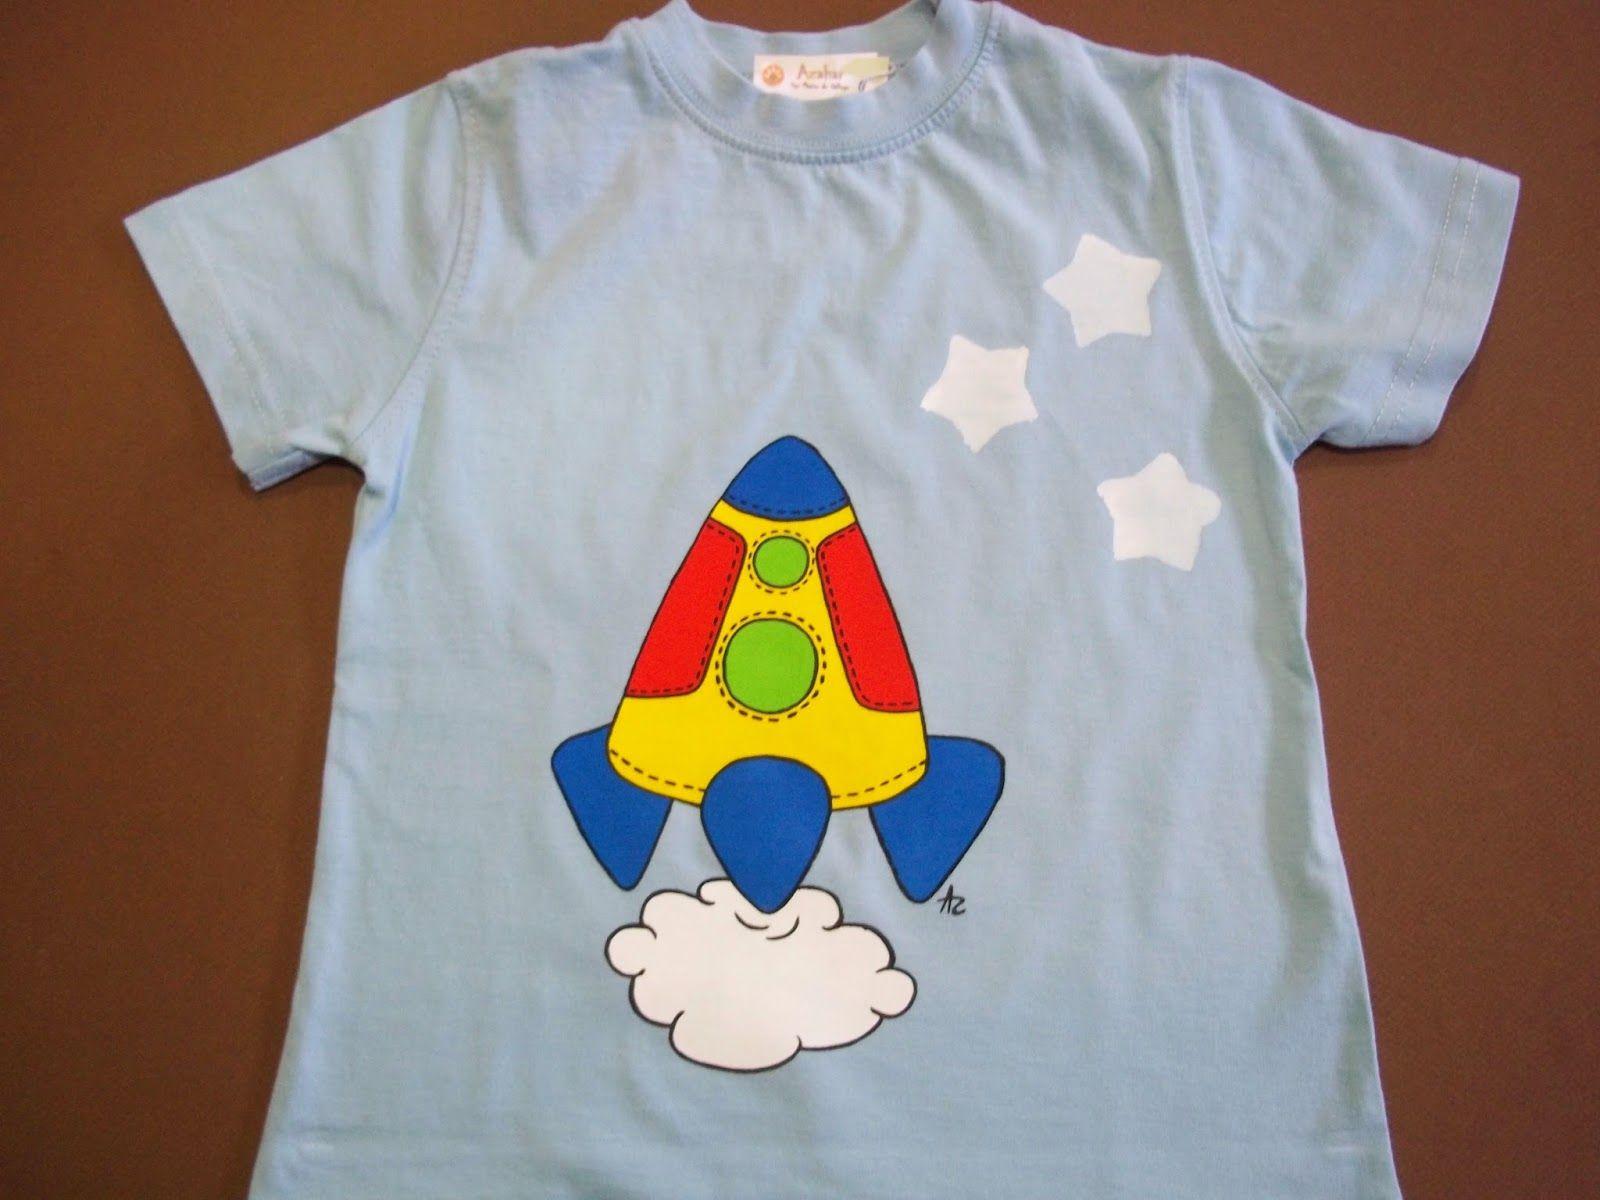 El Blanco Azahar Camisetas Infantiles Pintadas A Mano Pintura  ~ Ideas Para Decorar Camisetas Infantiles